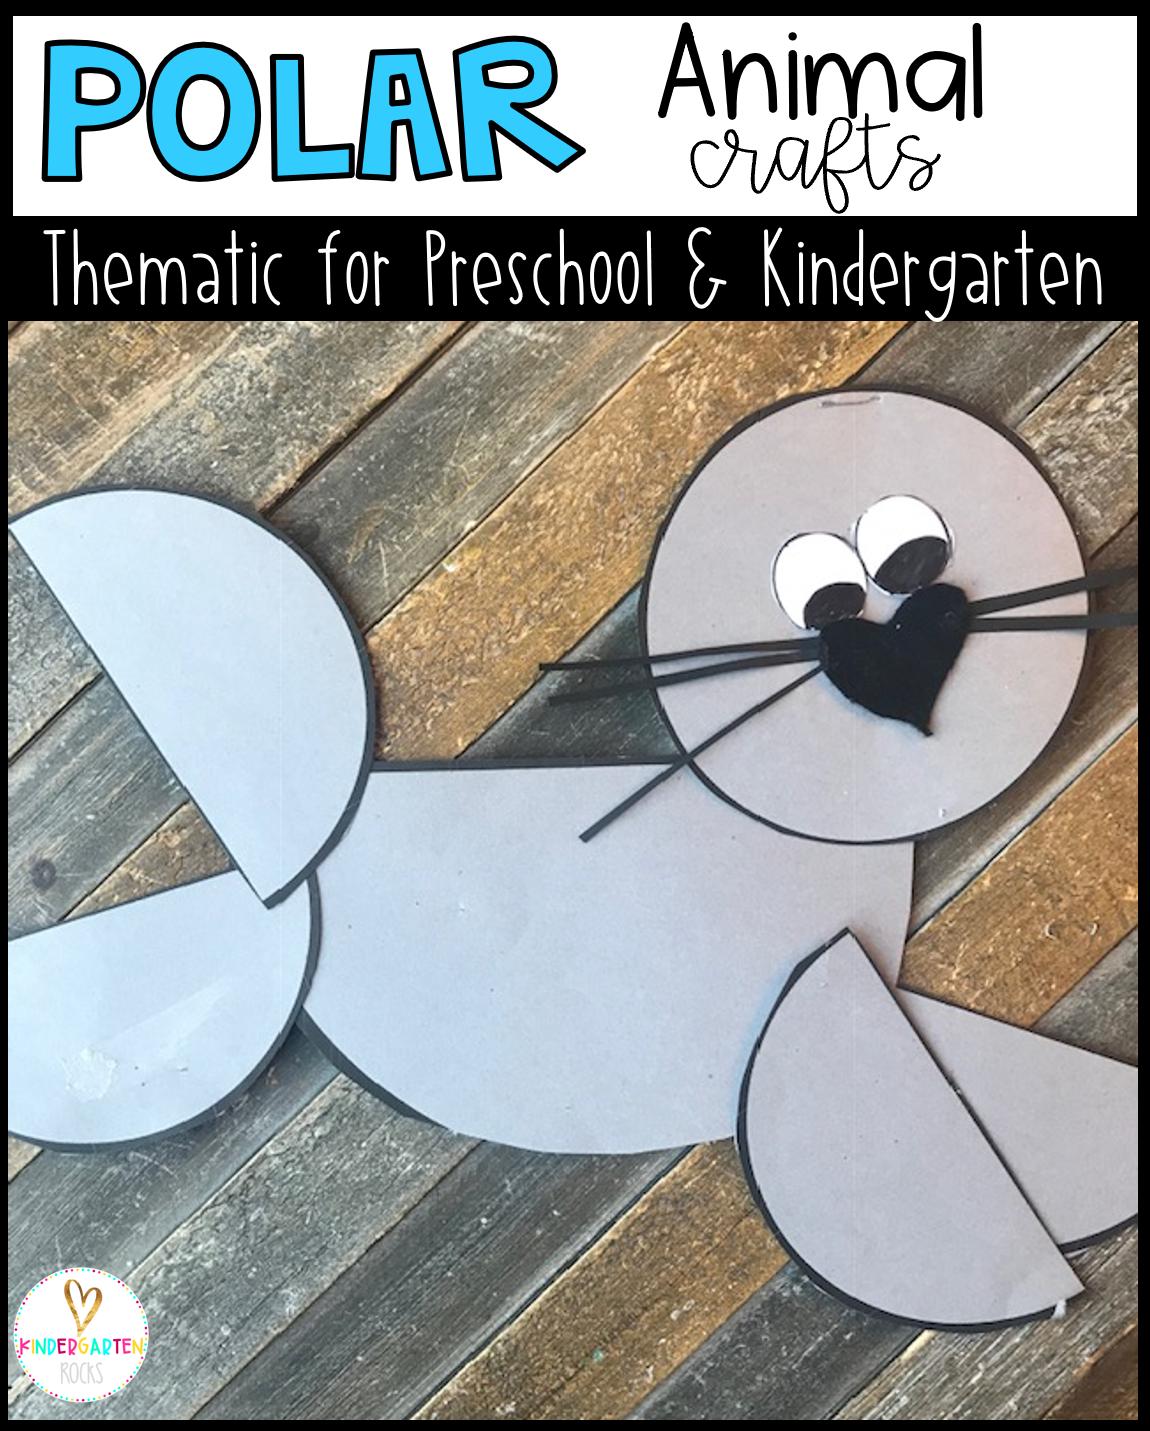 Polar Animal Crafts For Kids Preschool And Kindergarten In